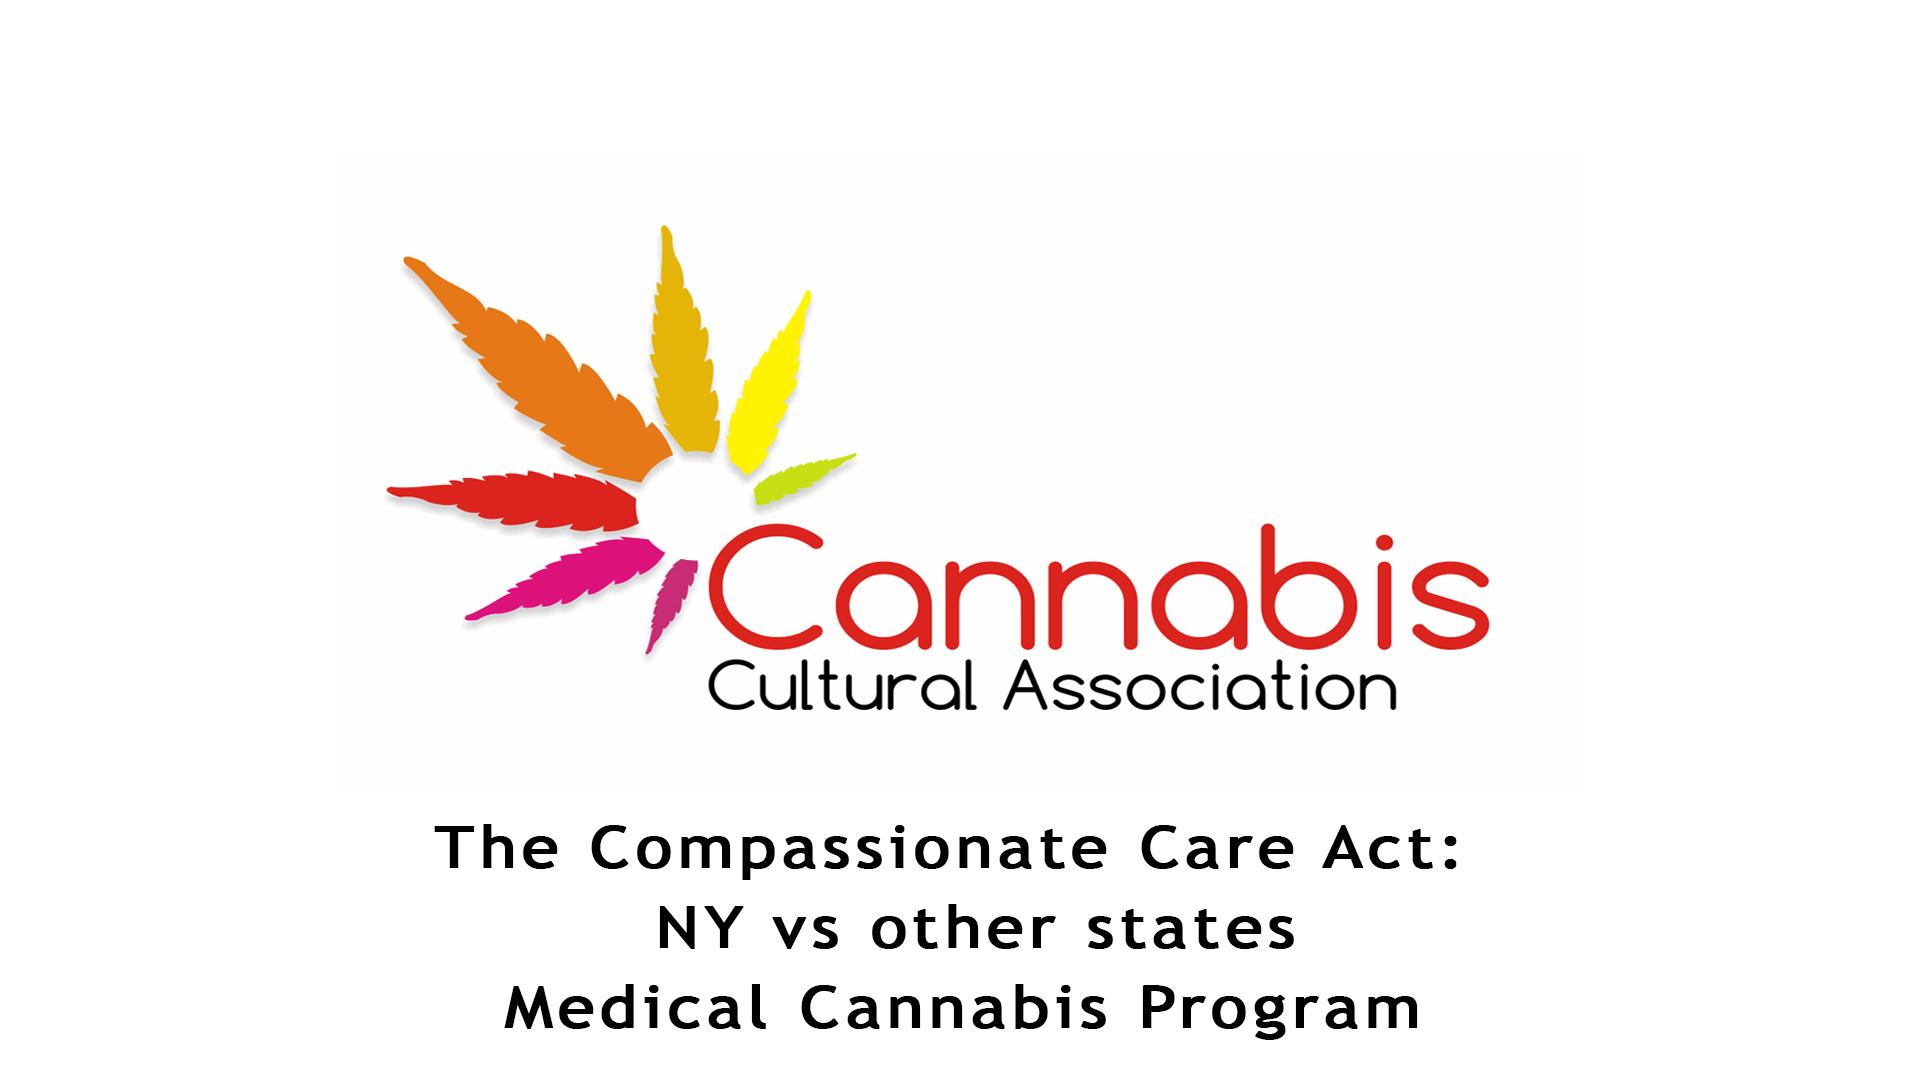 NY vs other states Medical Cannabis Program